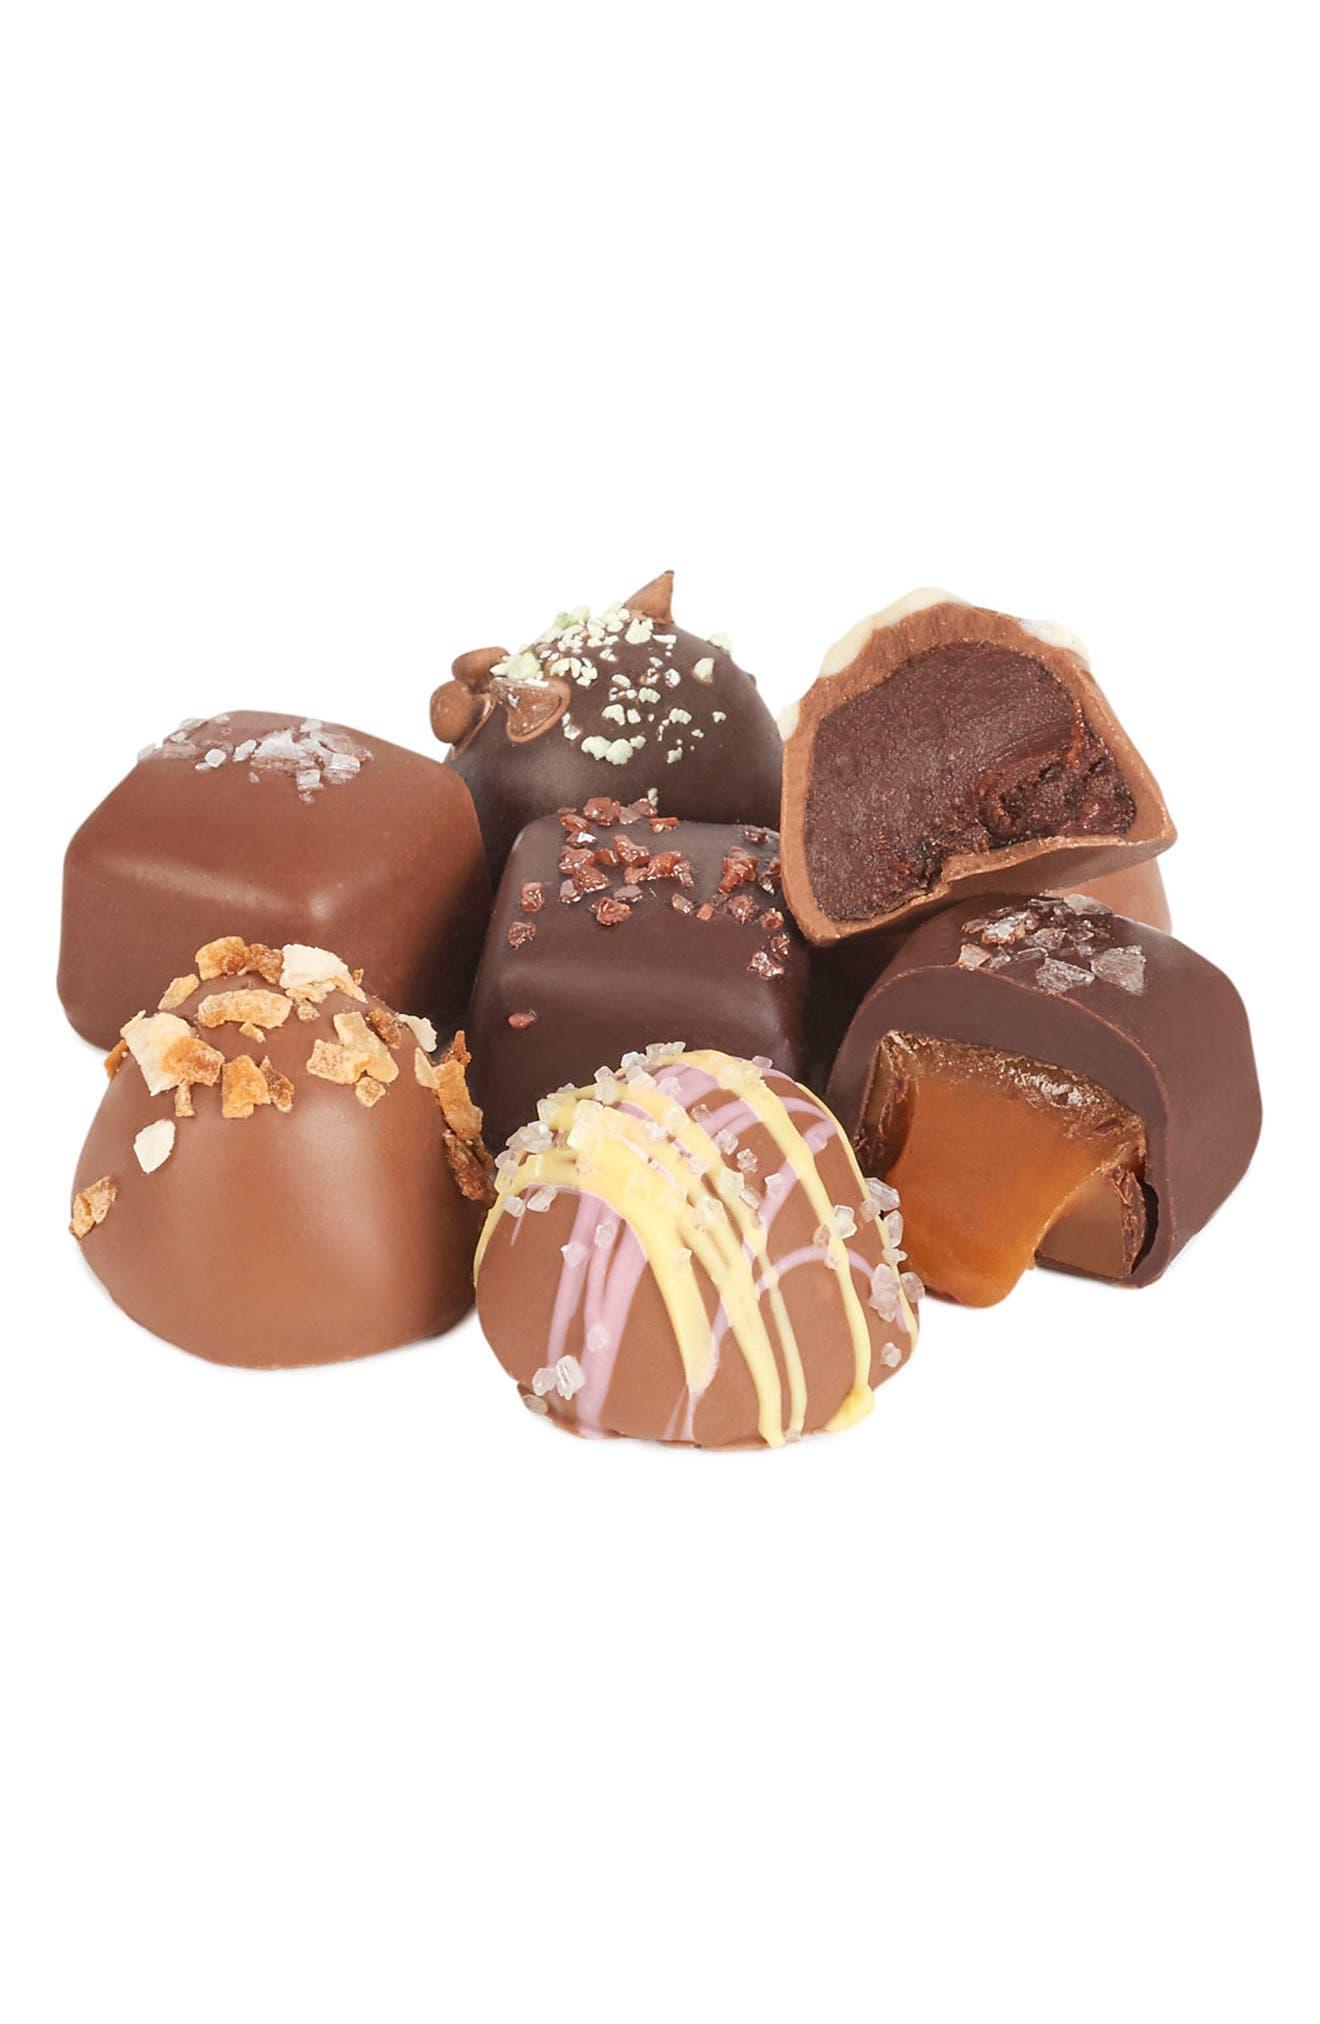 Bar Choc-A-Lot Chocolate Covered Craft Sea Salt Caramels & Truffles Mixed Assortment,                             Alternate thumbnail 2, color,